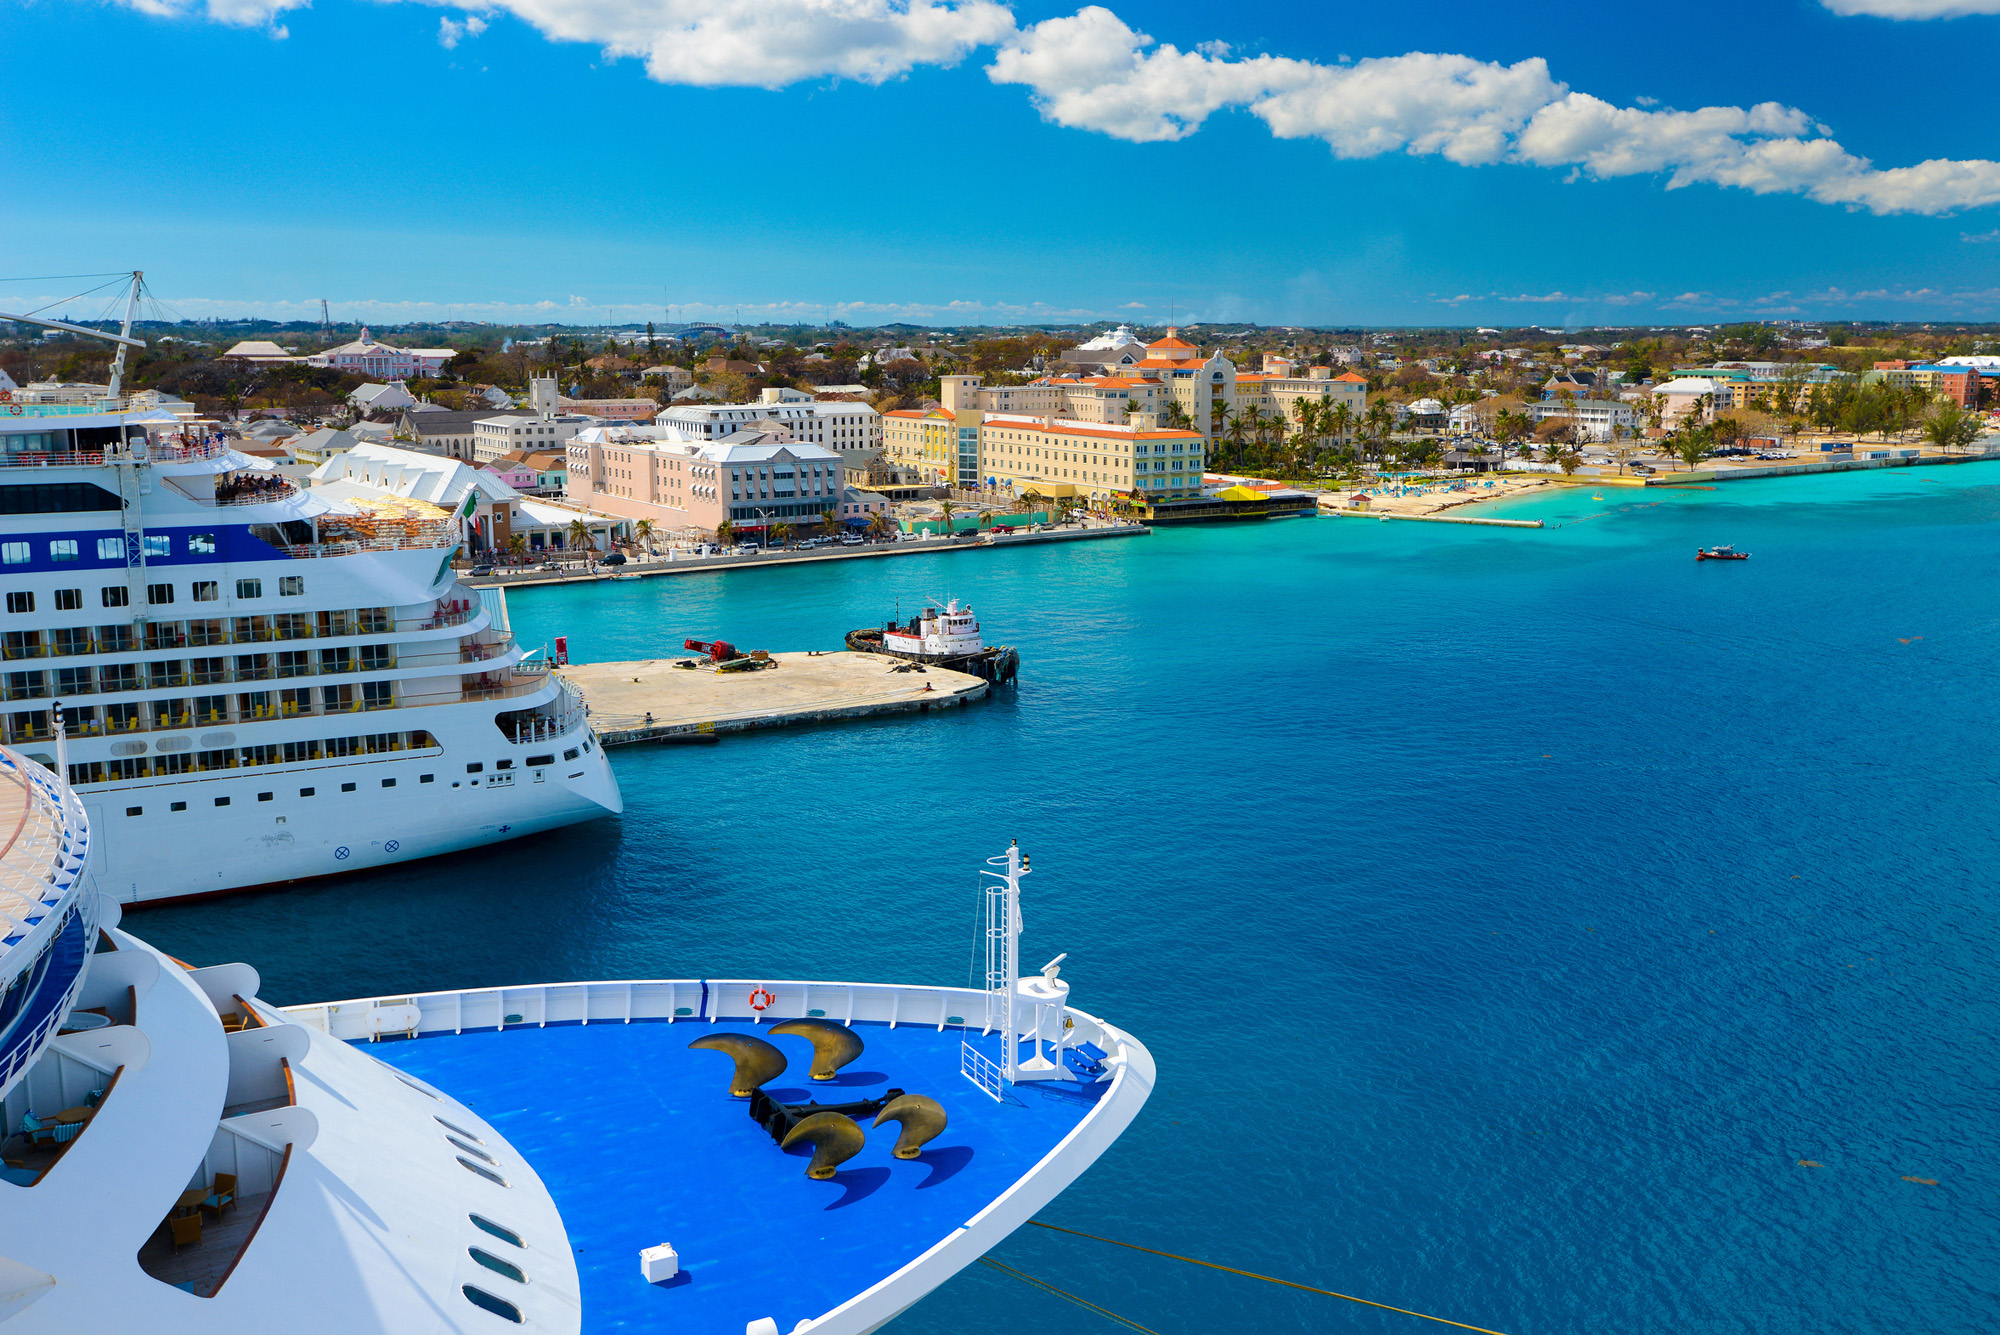 Bahamas Harbor - Cruise Ship